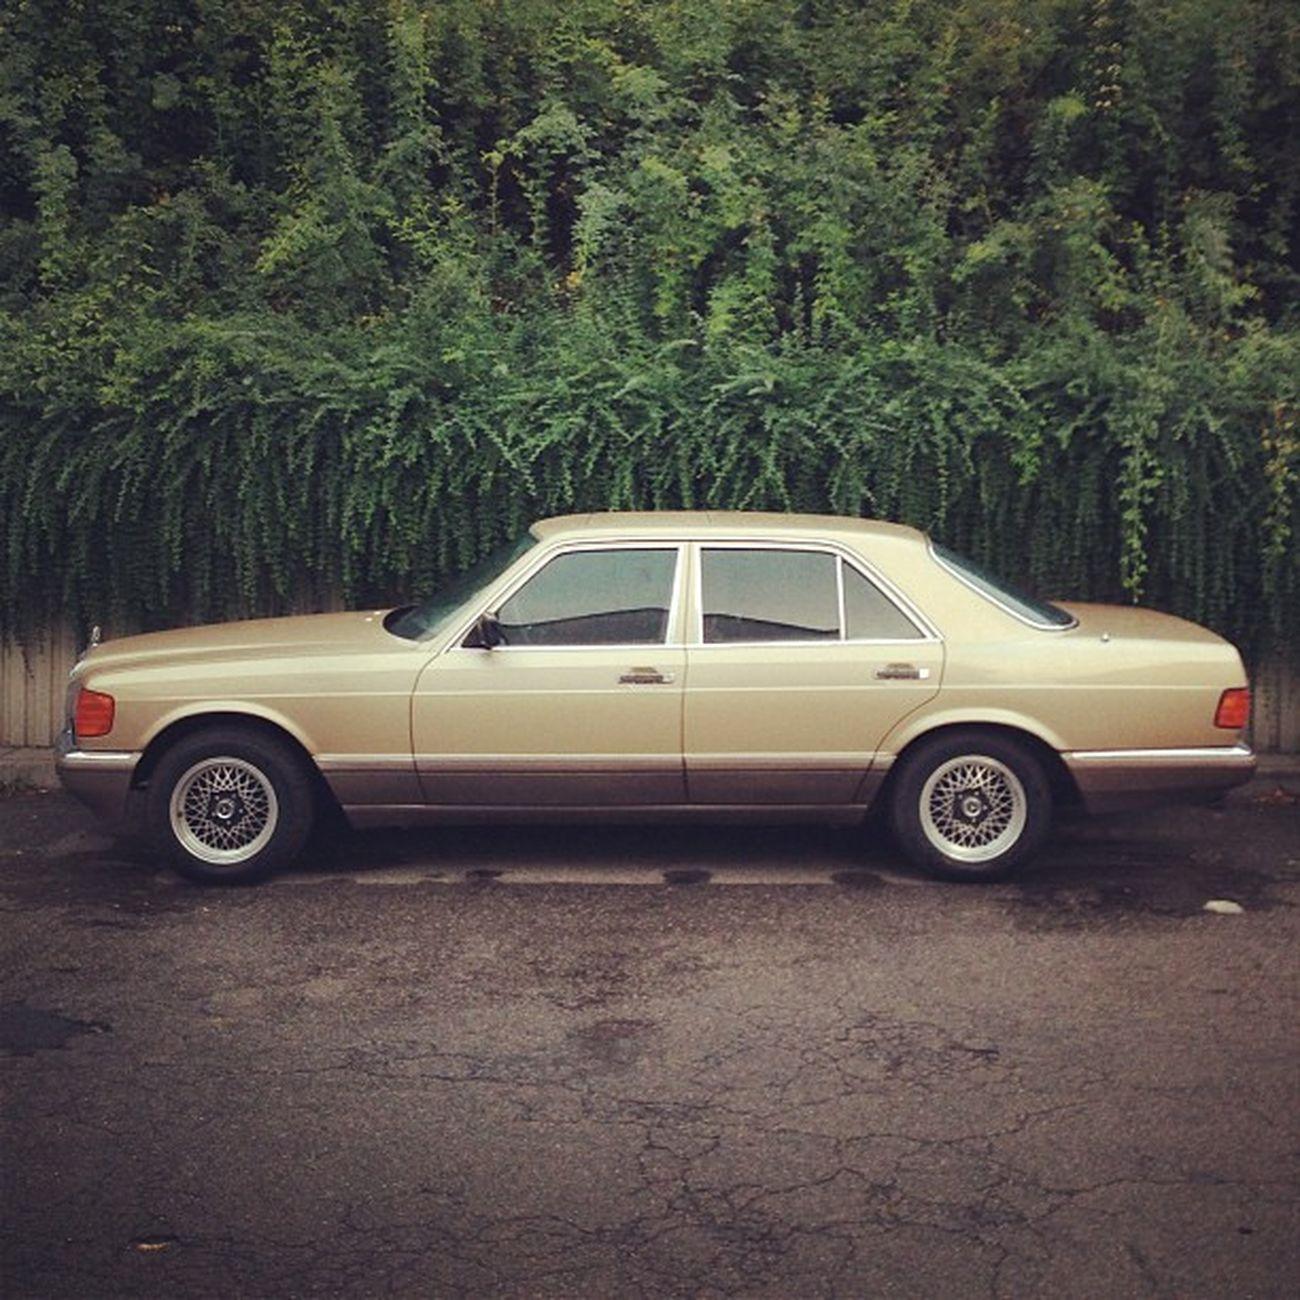 80ies #Karre Mercedes Karre Soloparking Classiccar Benz Vintagecar Altekarrenbattle 260se